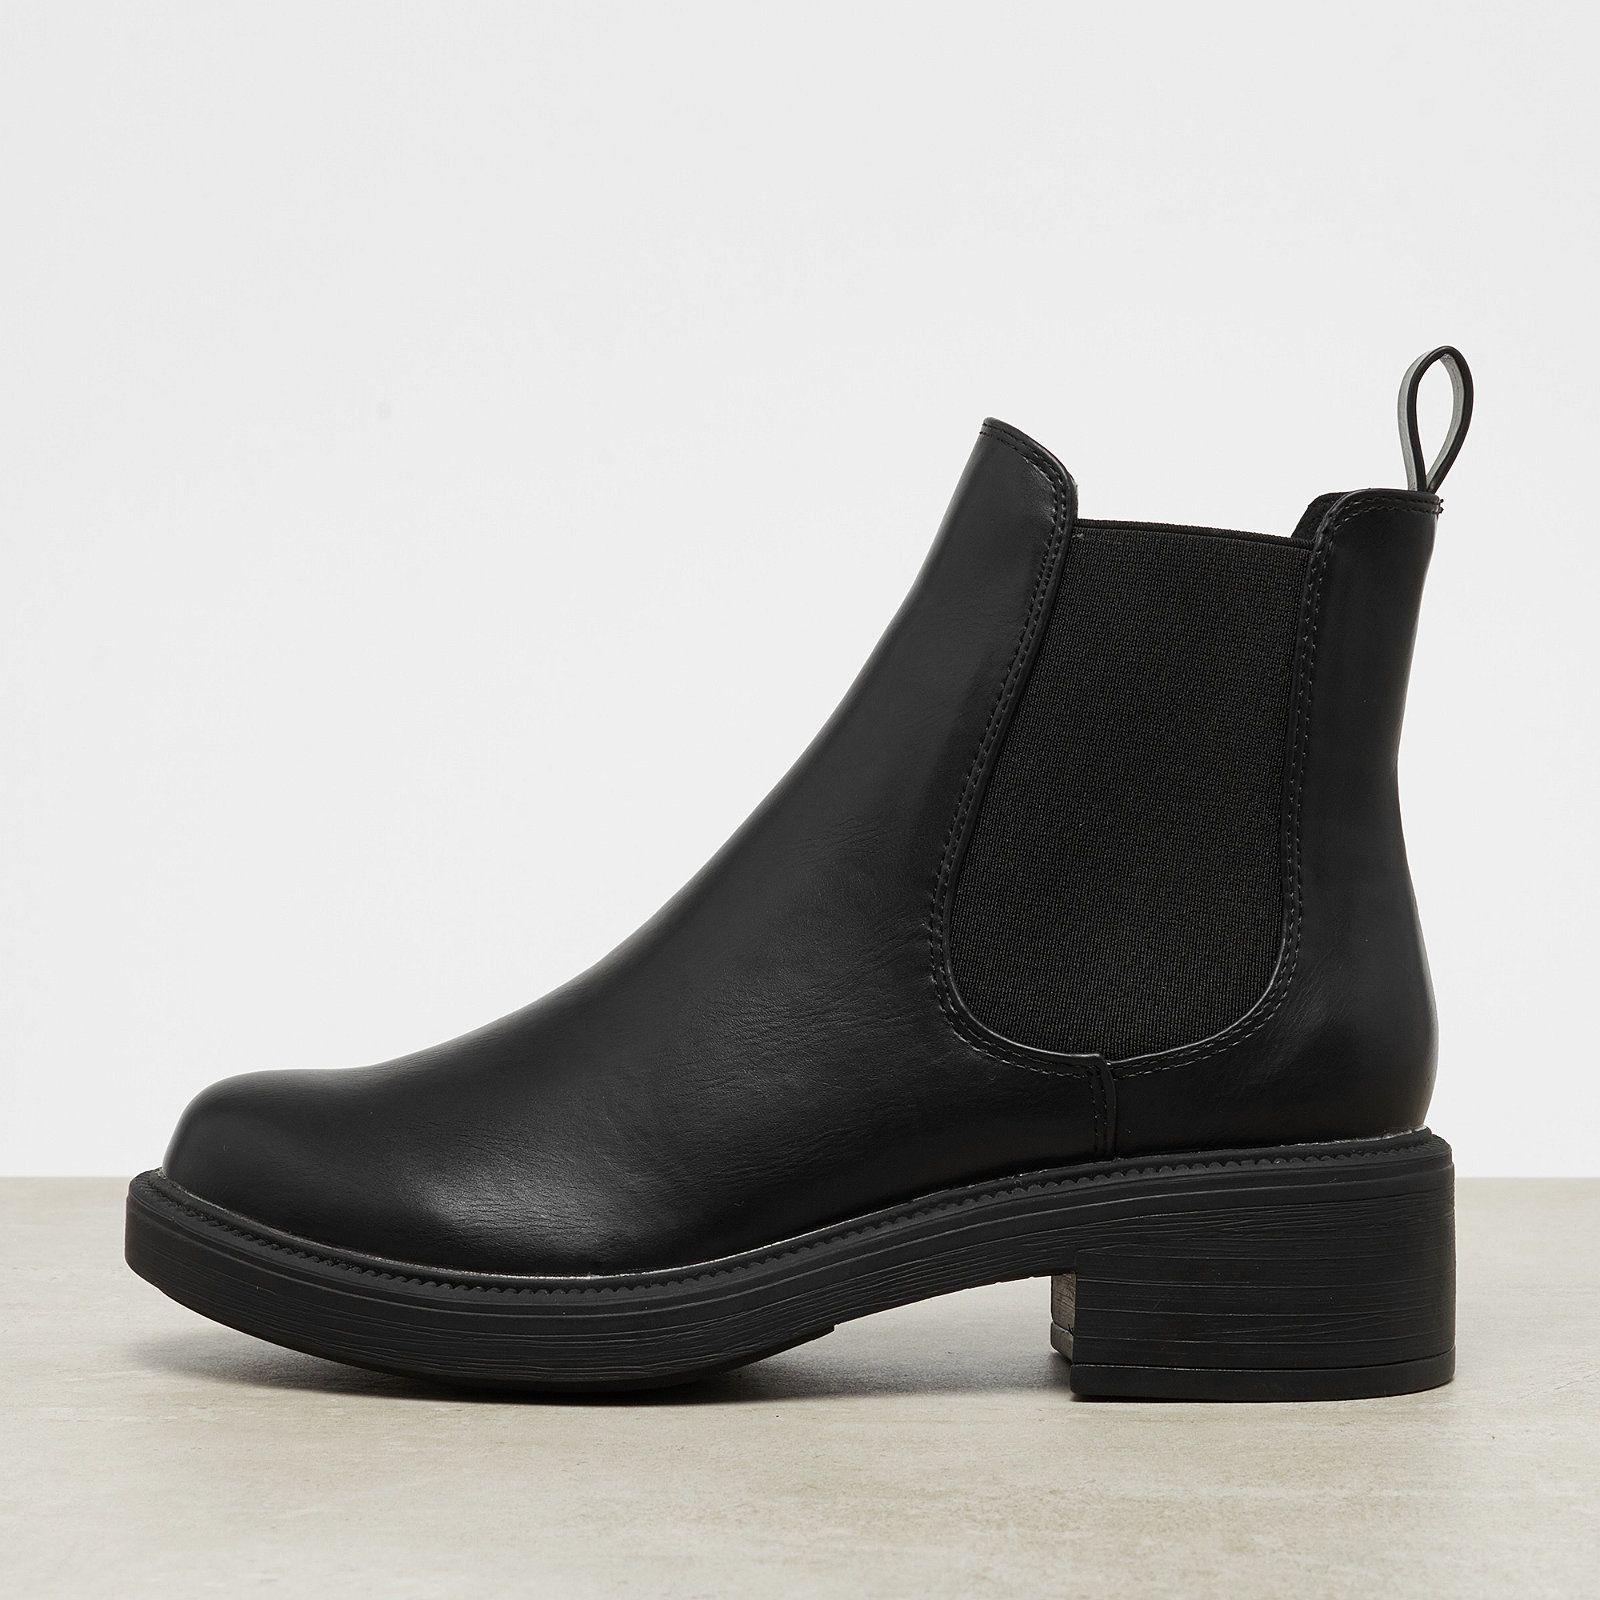 Fluid Damen Chelsea Stiefel Grau T25bnLpC